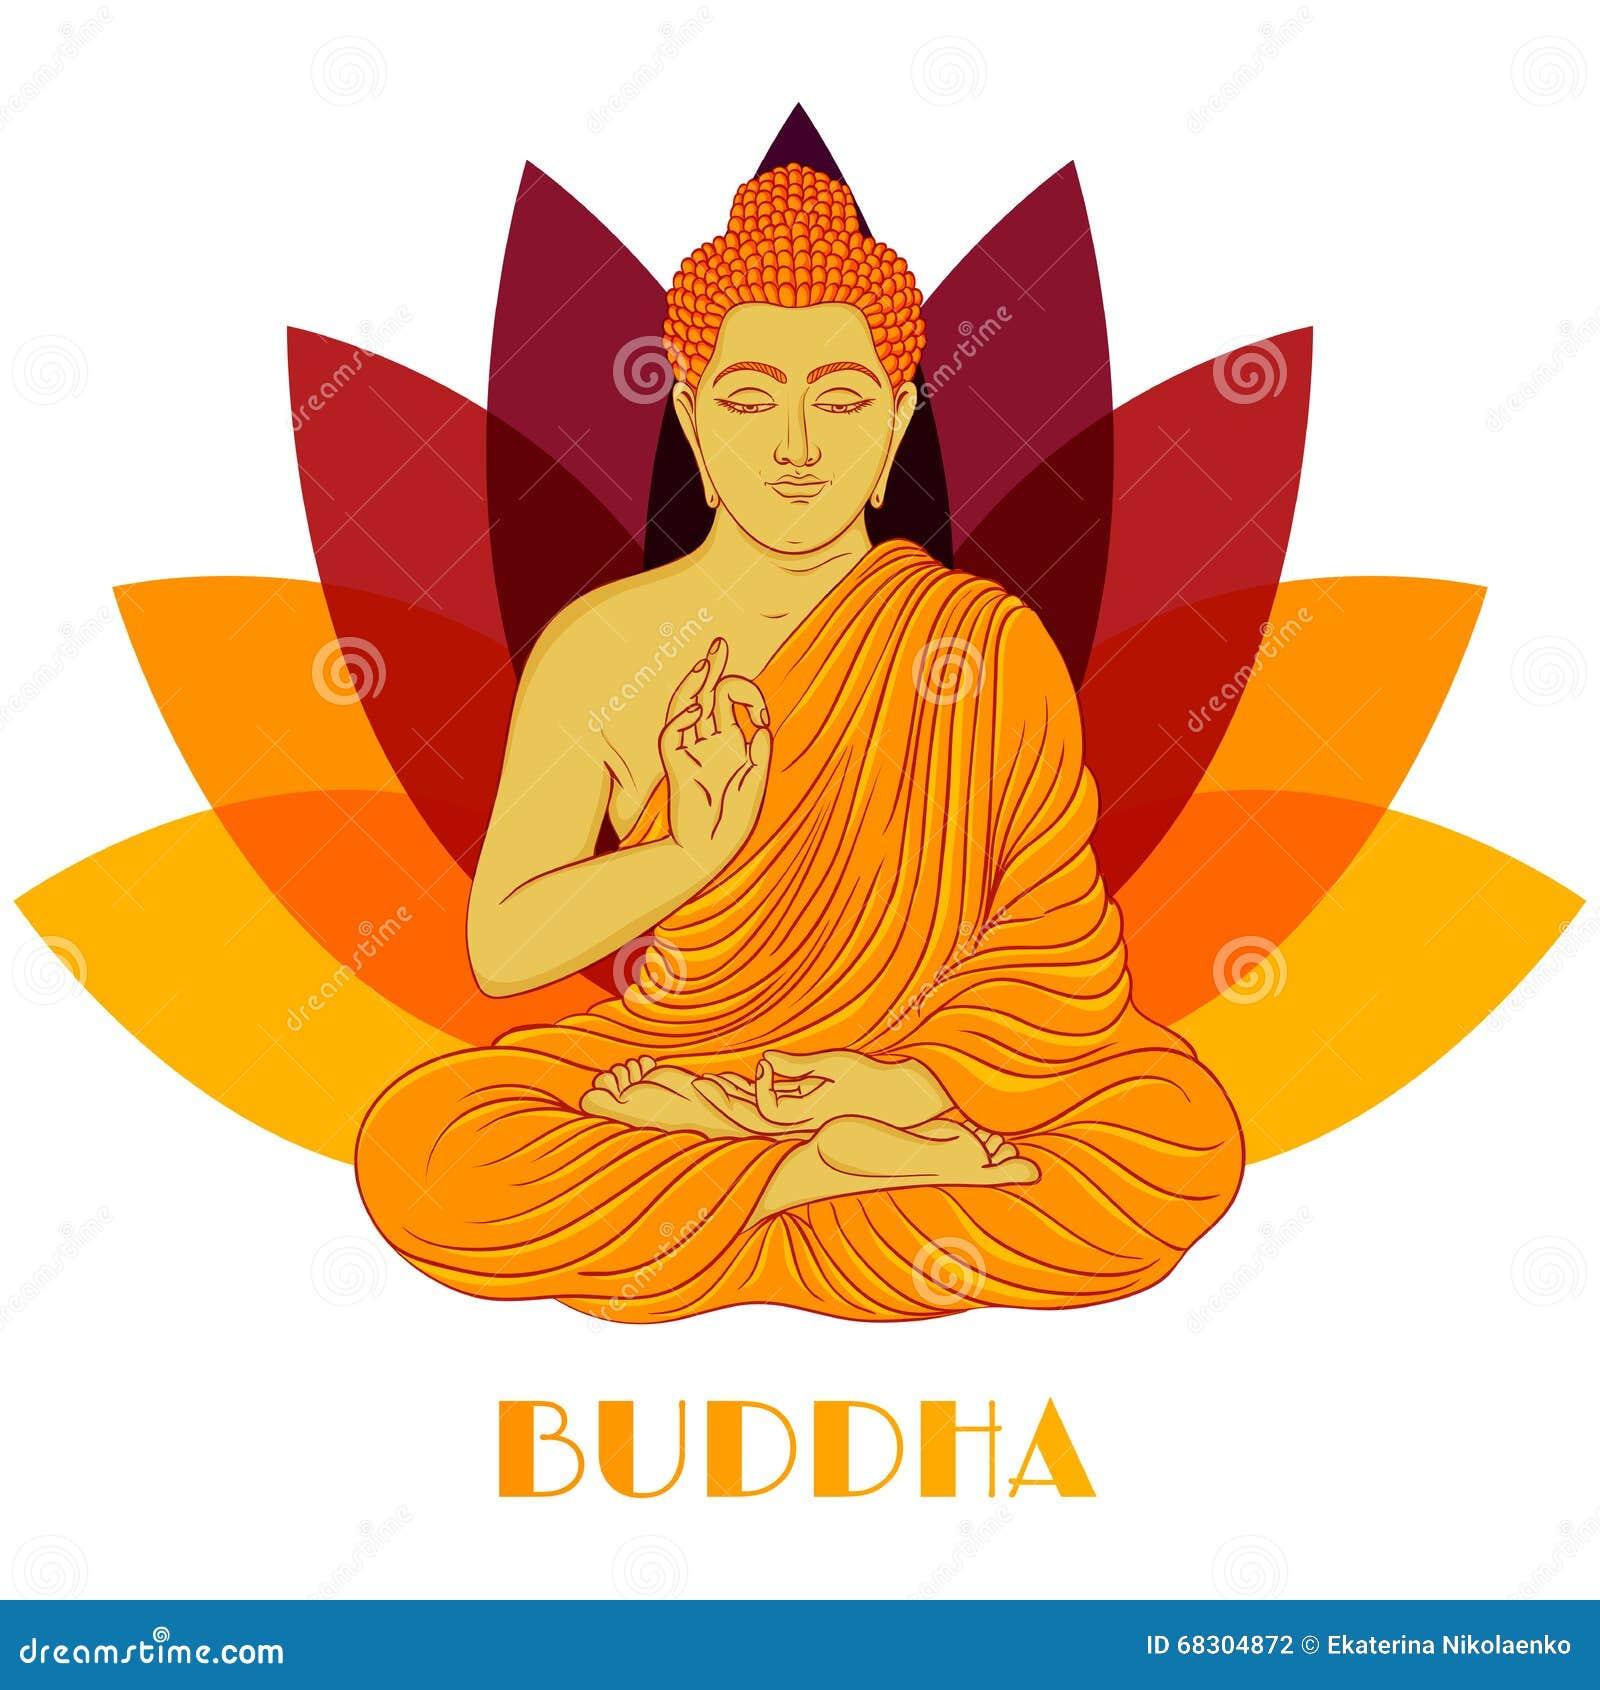 Lotus flower and buddha stock image image of reflected 28197281 sitting buddha over lotus flower background hand drawn vector vector illustration mightylinksfo